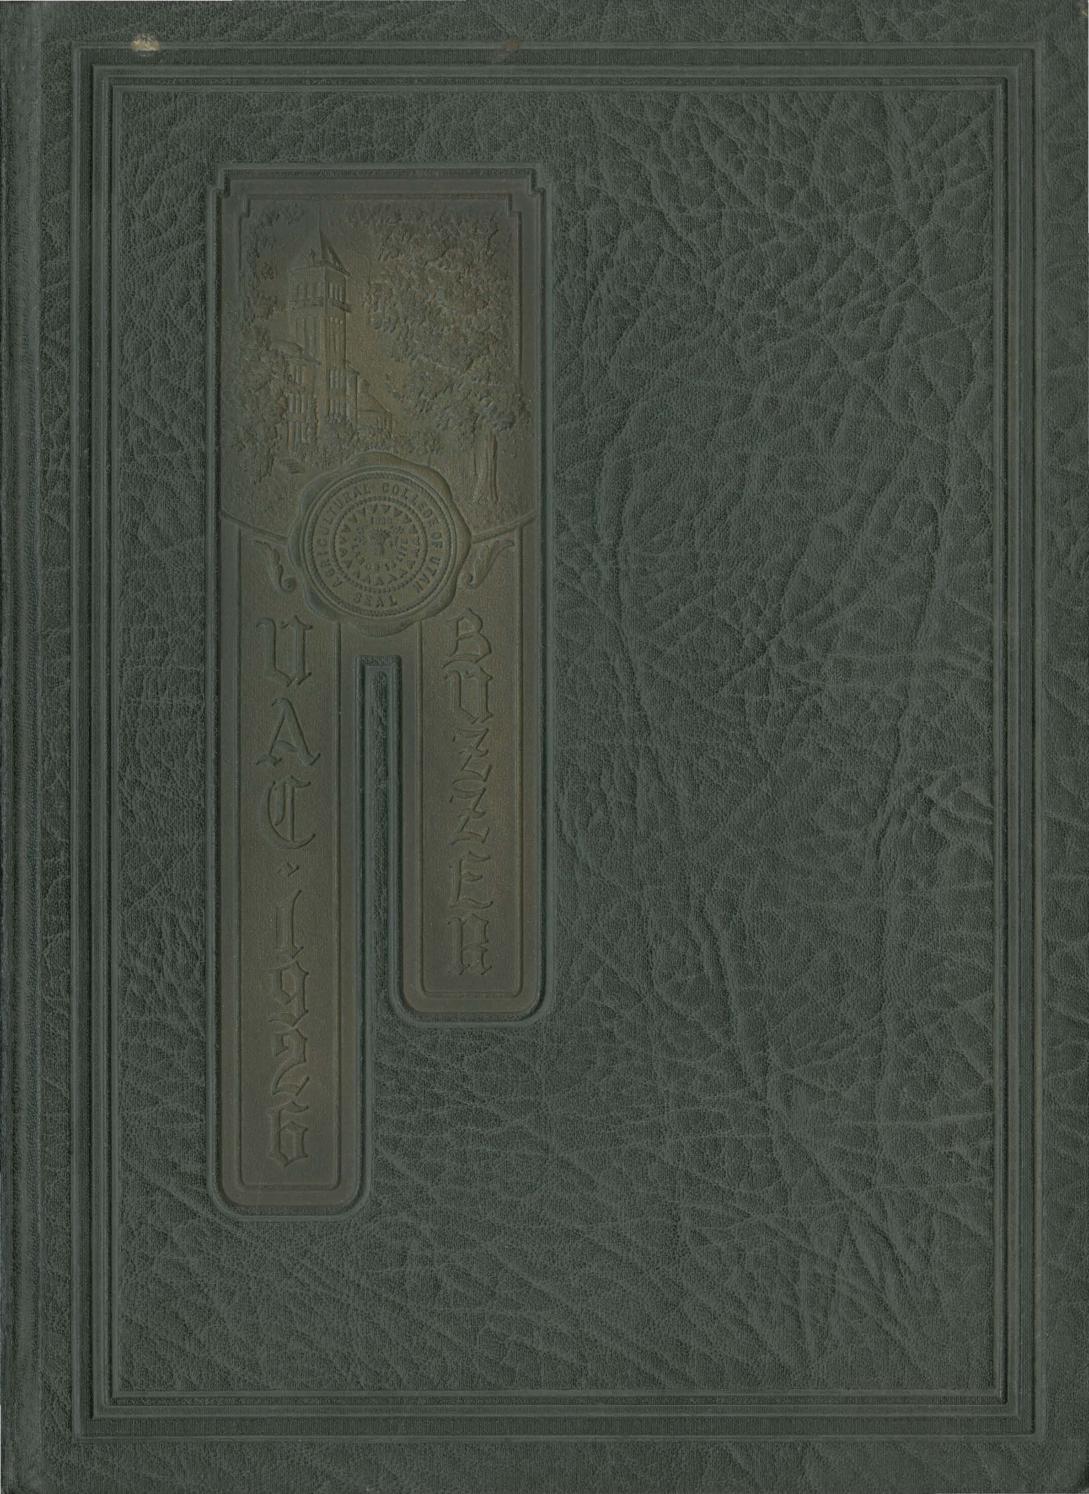 Scaua 25p05s07 1926 By Usu Digital Commons Issuu